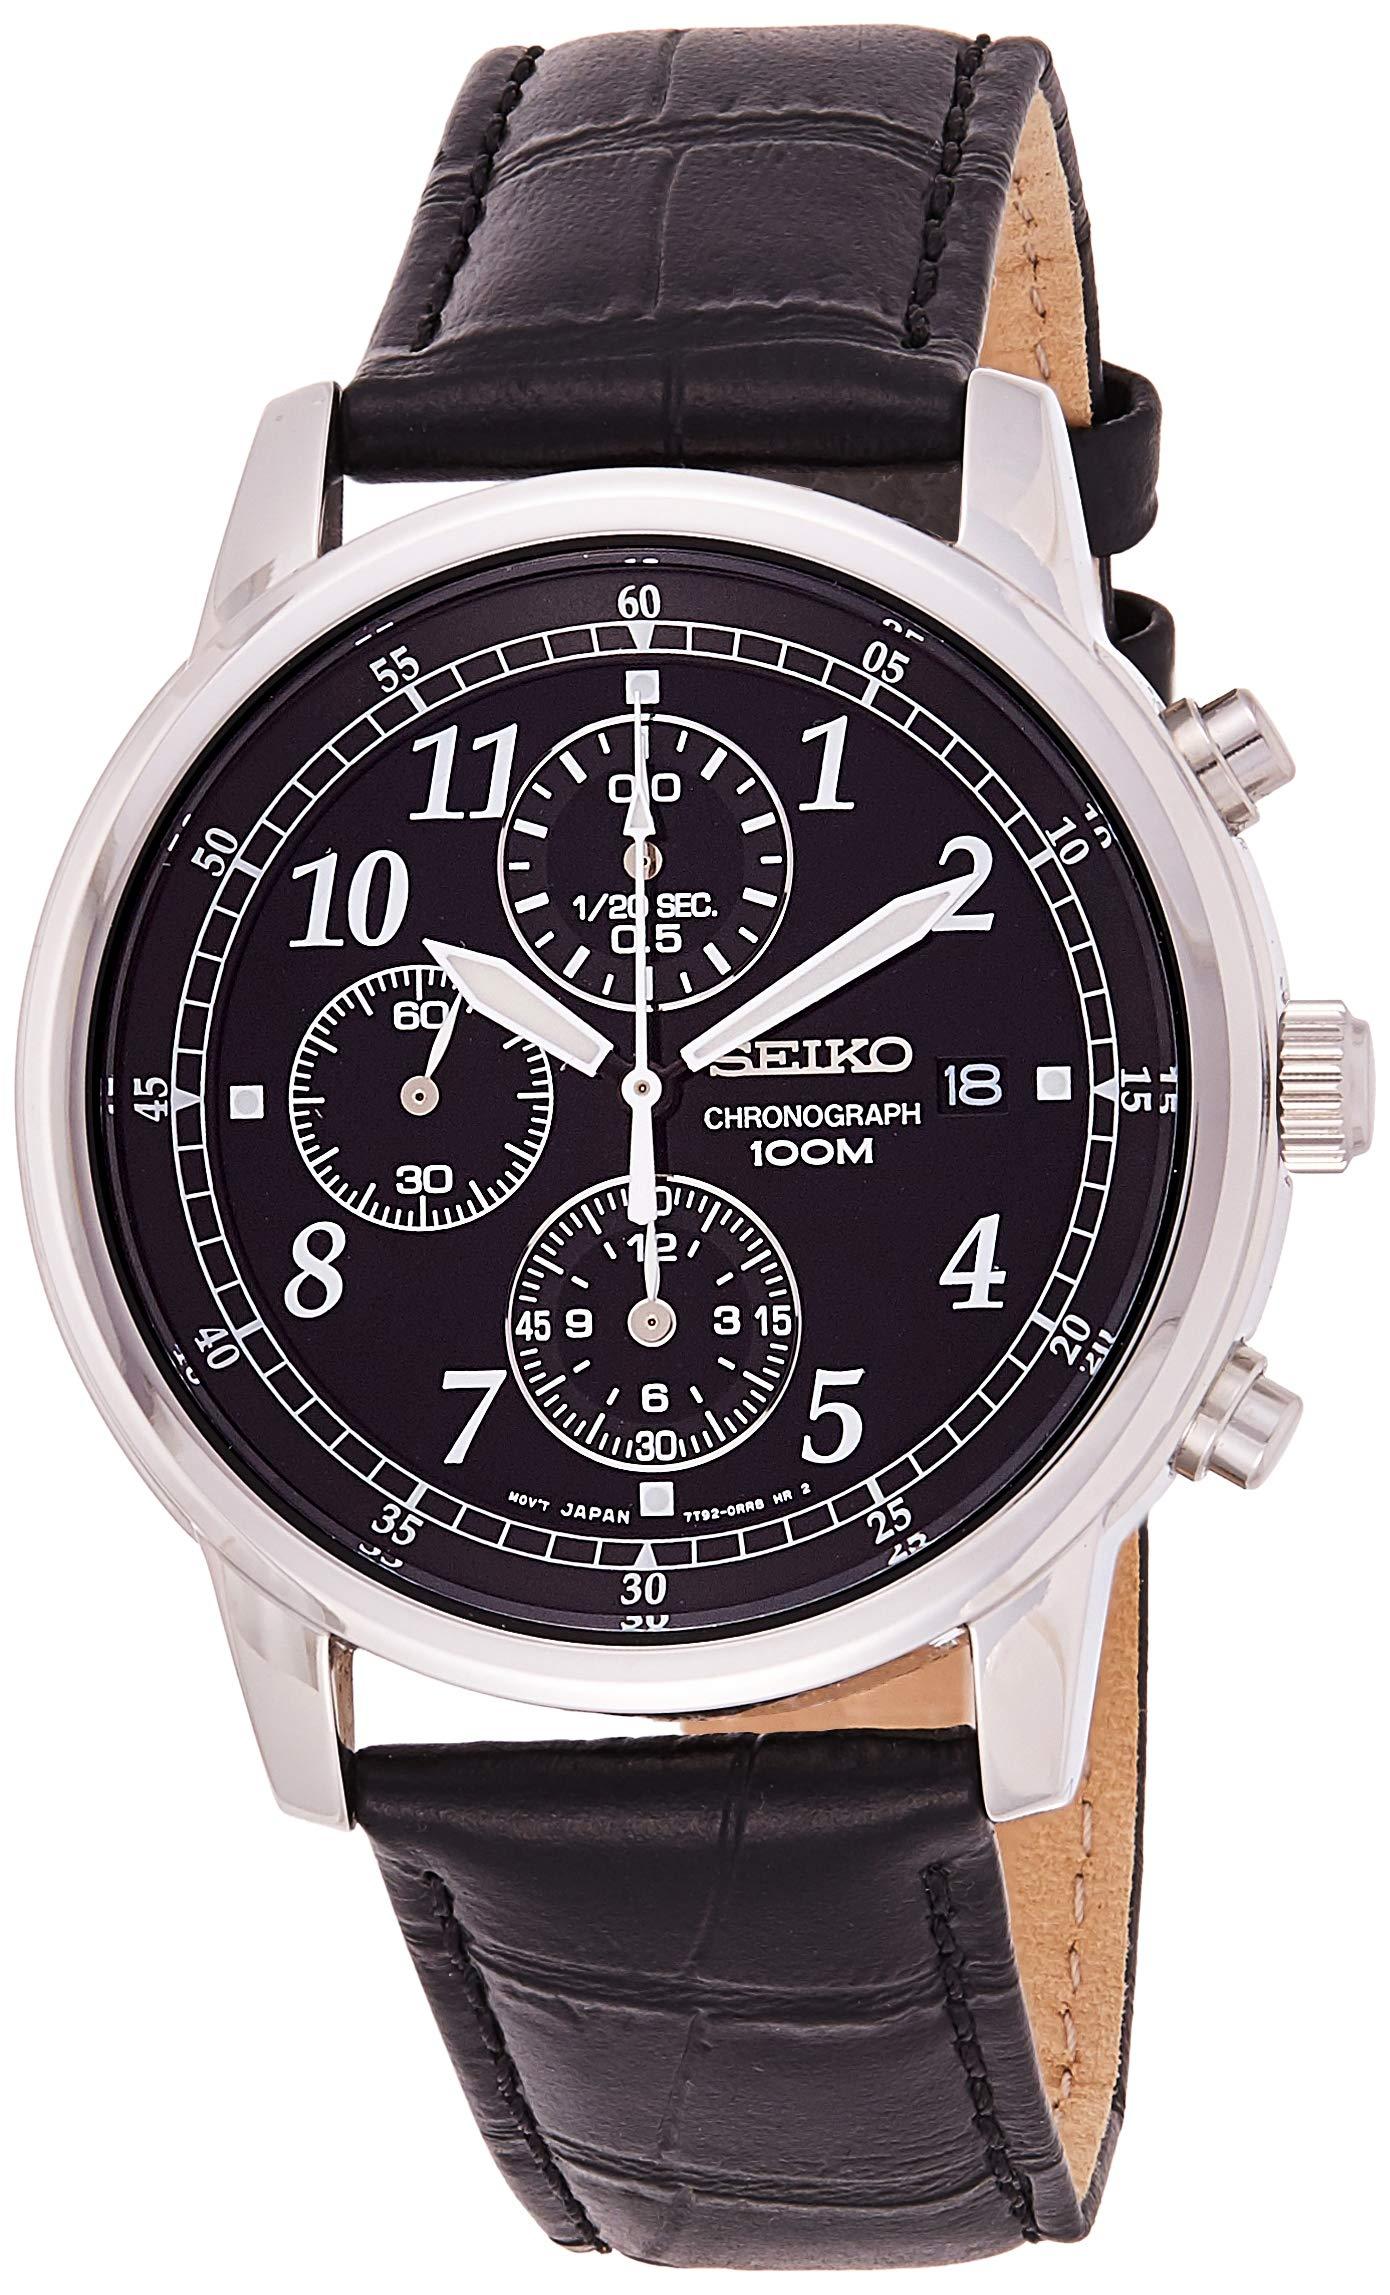 Seiko Men's Chronograph Quartz Watch with Leather Strap – SNDC33P1